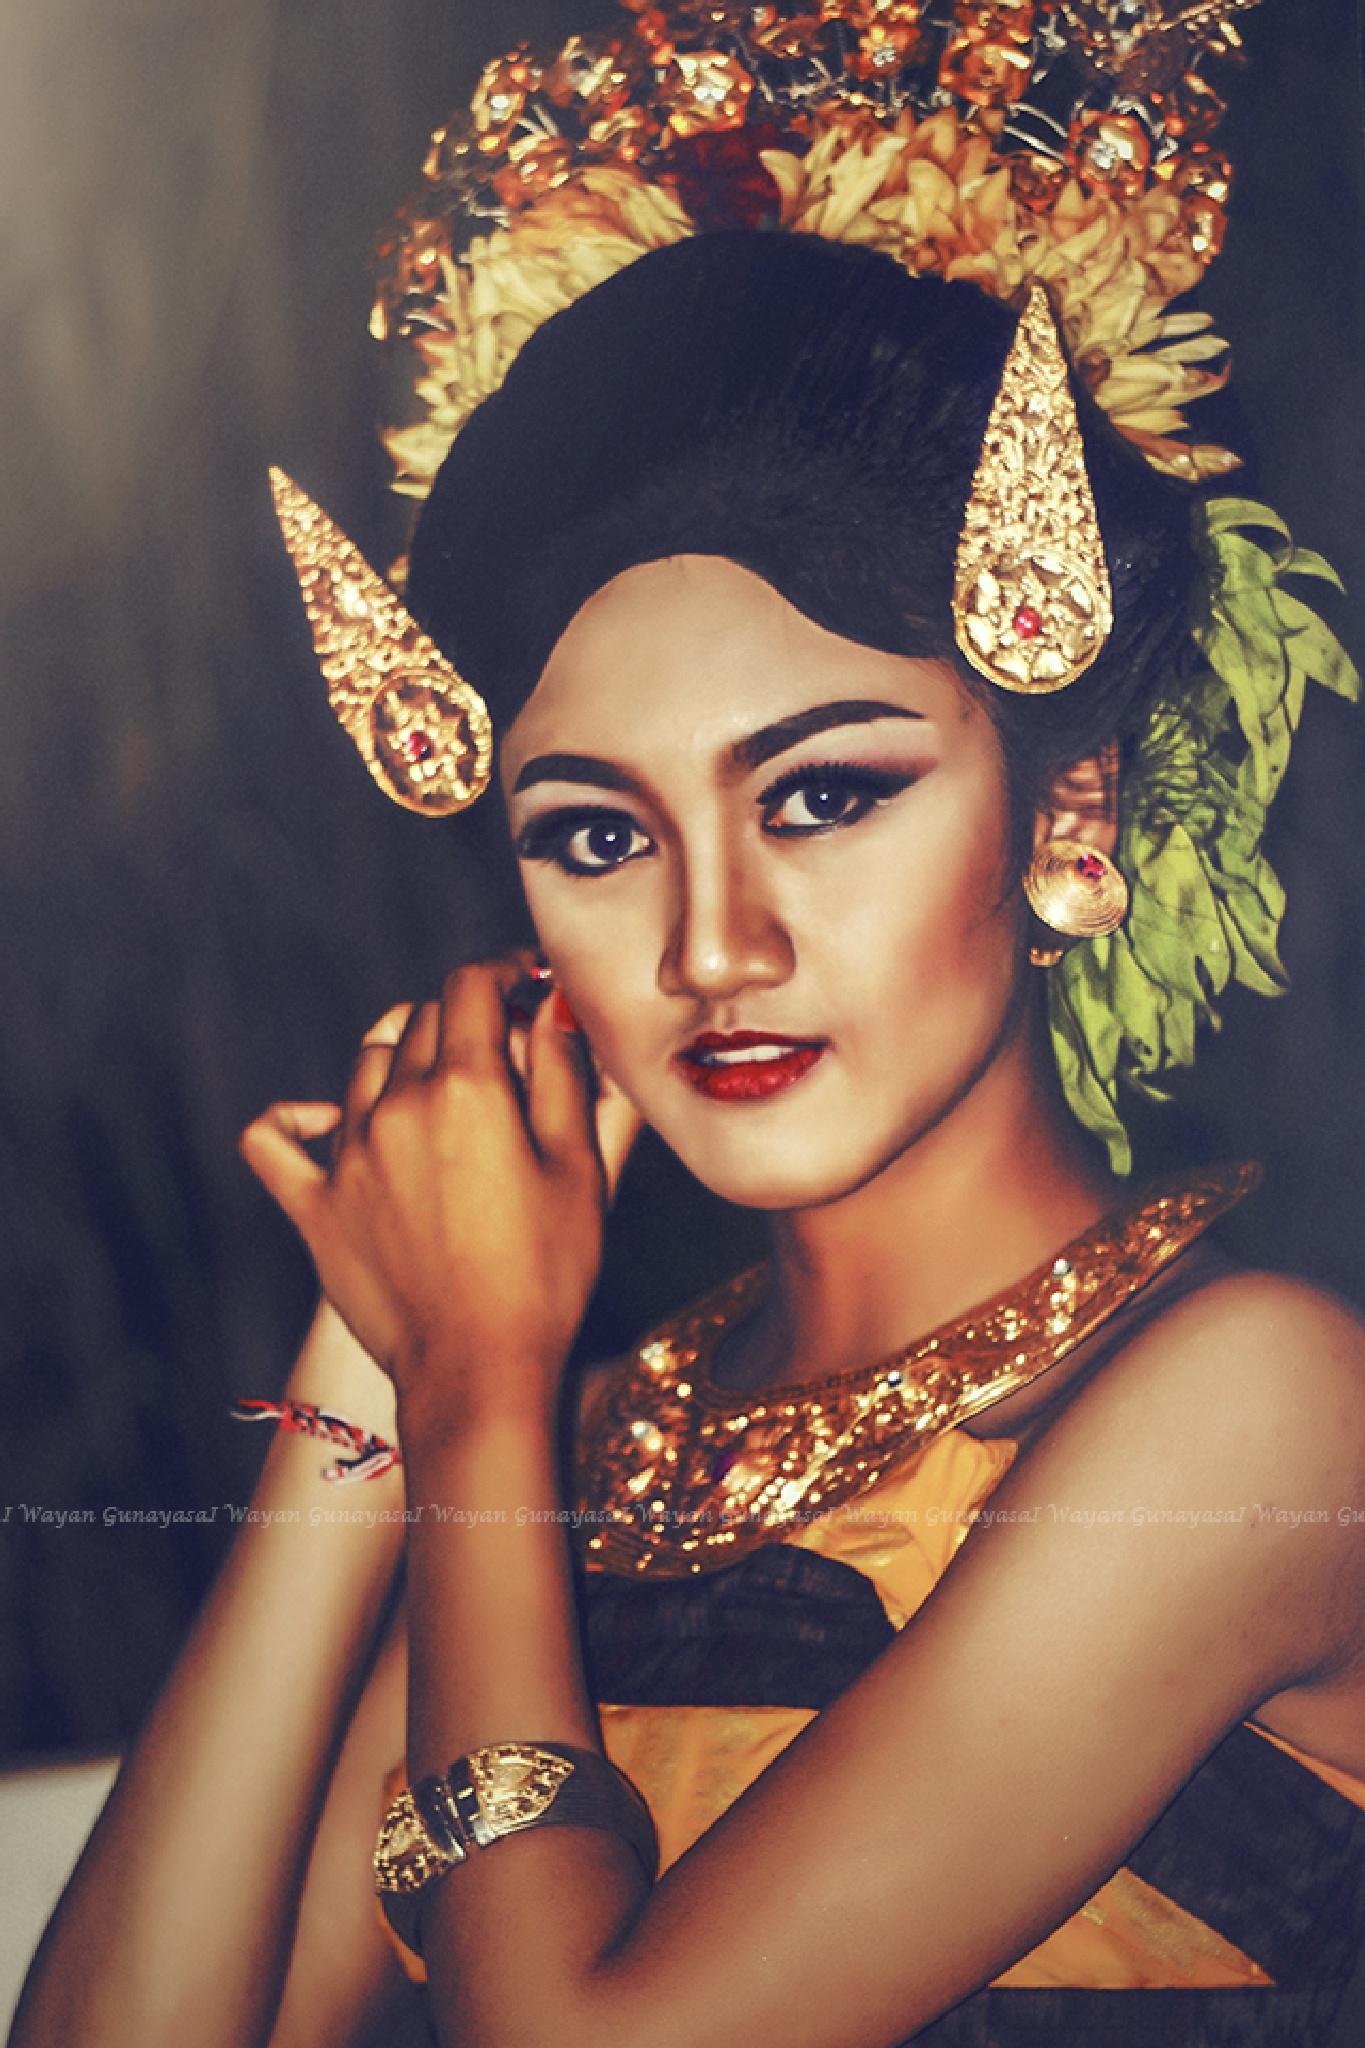 A beautiful eyes by yangunayasa63